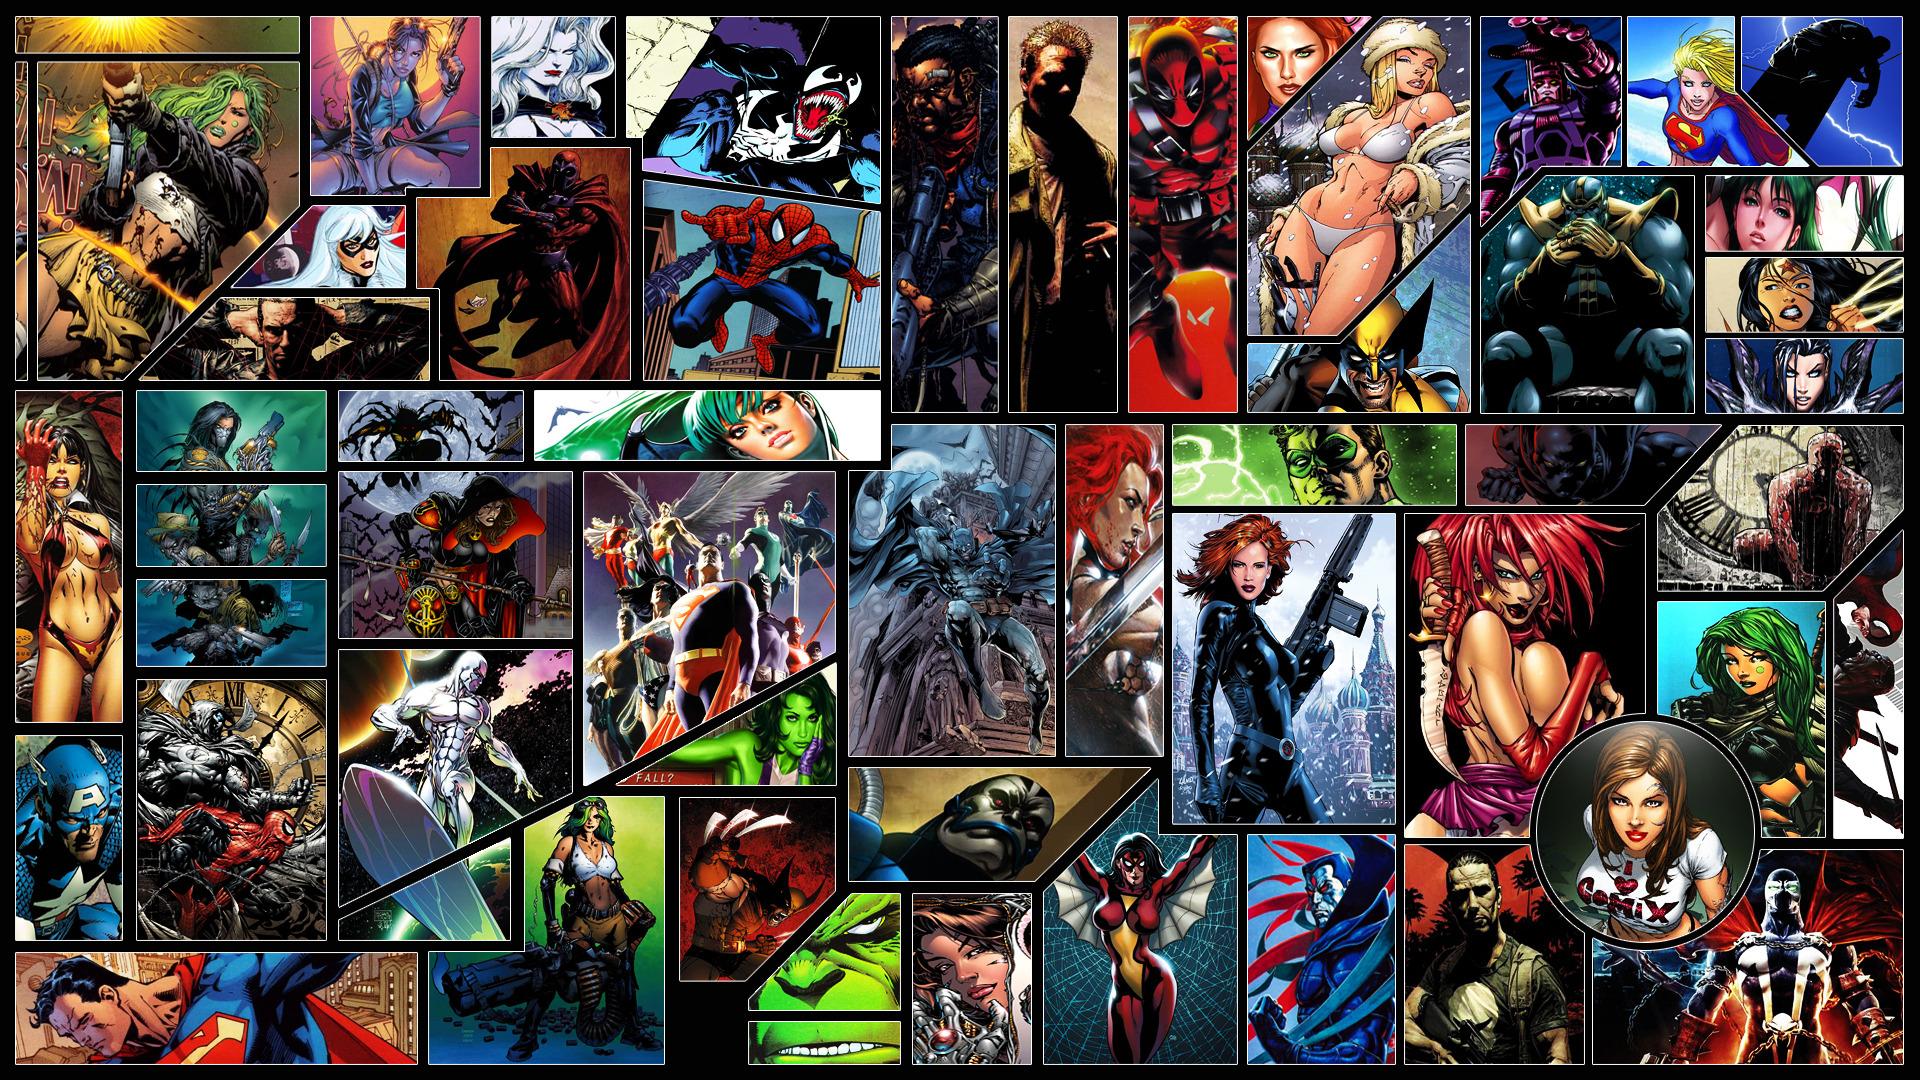 tweet 1920x1080 comics dc comics marvel character resolution 1920x1080 1920x1080